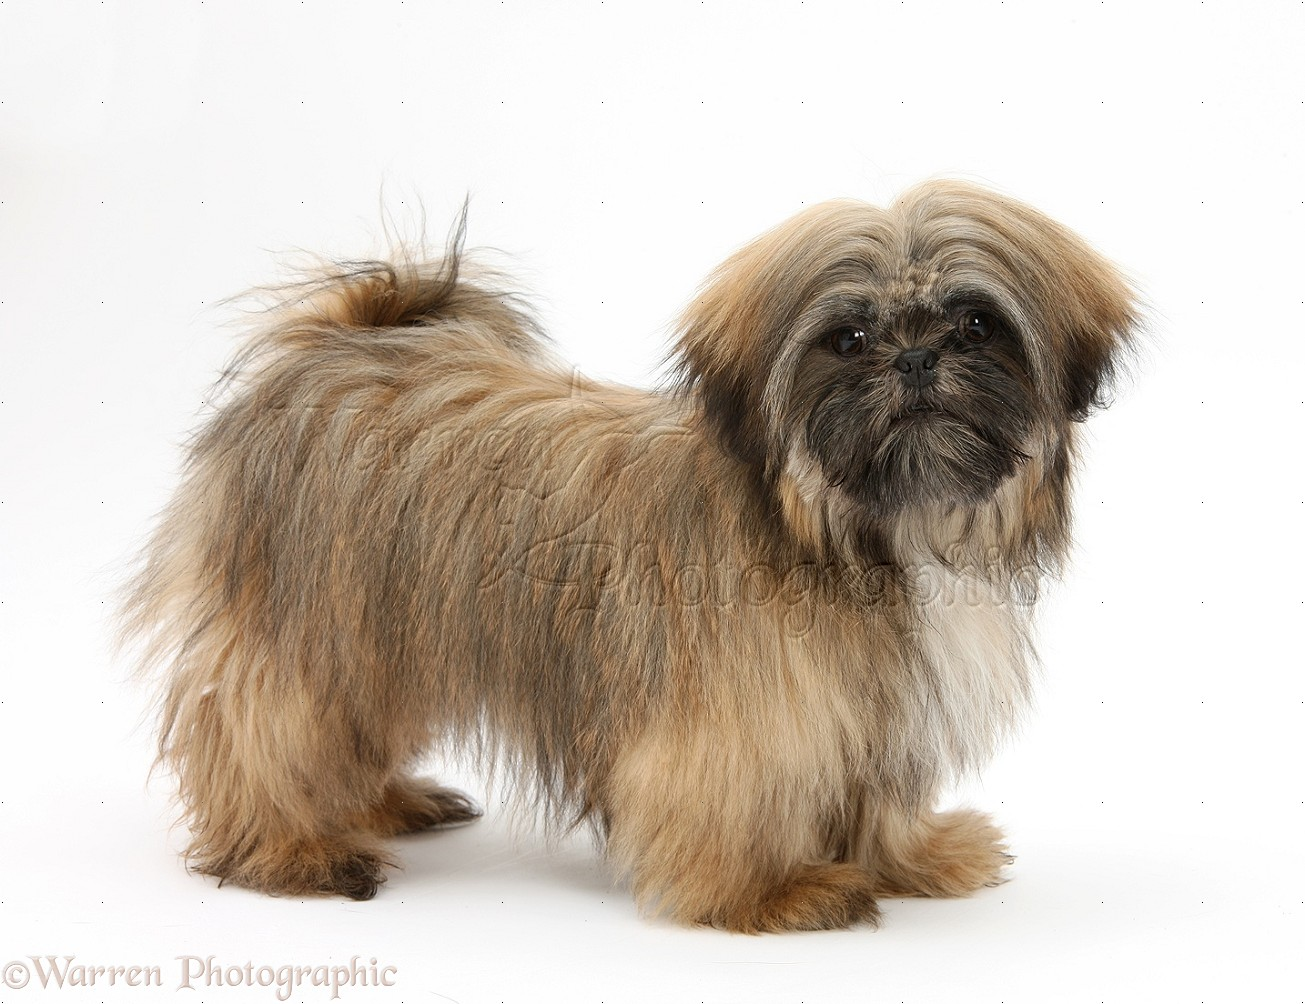 Dog Brown Shih Tzu Photo Wp28129